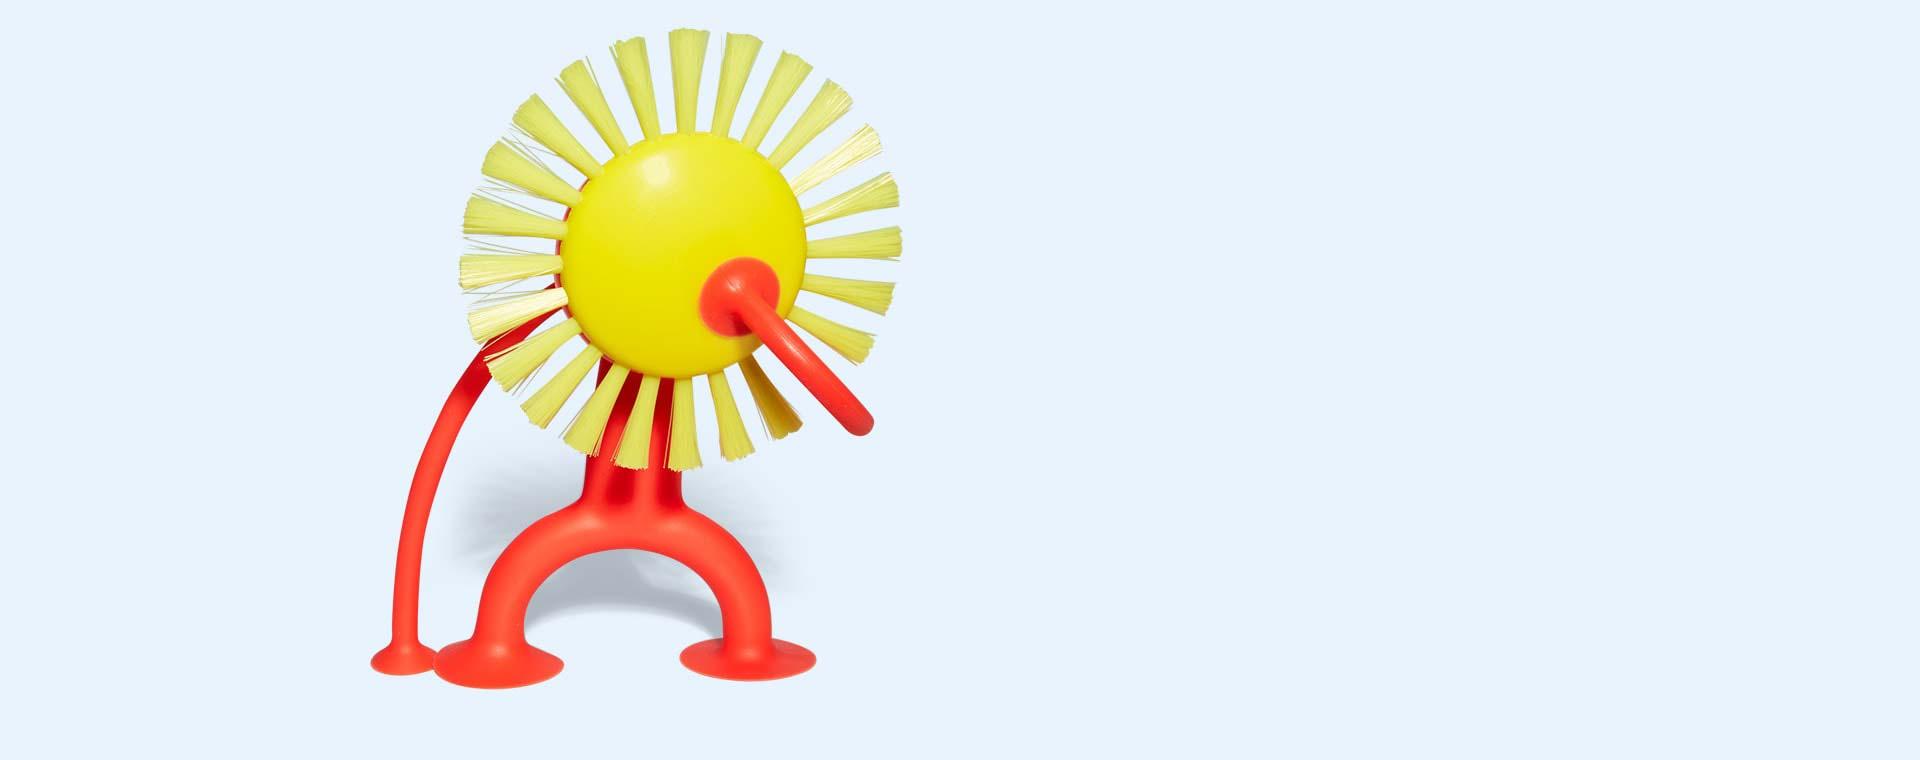 Yellow Moluk Plui Brush Sunny